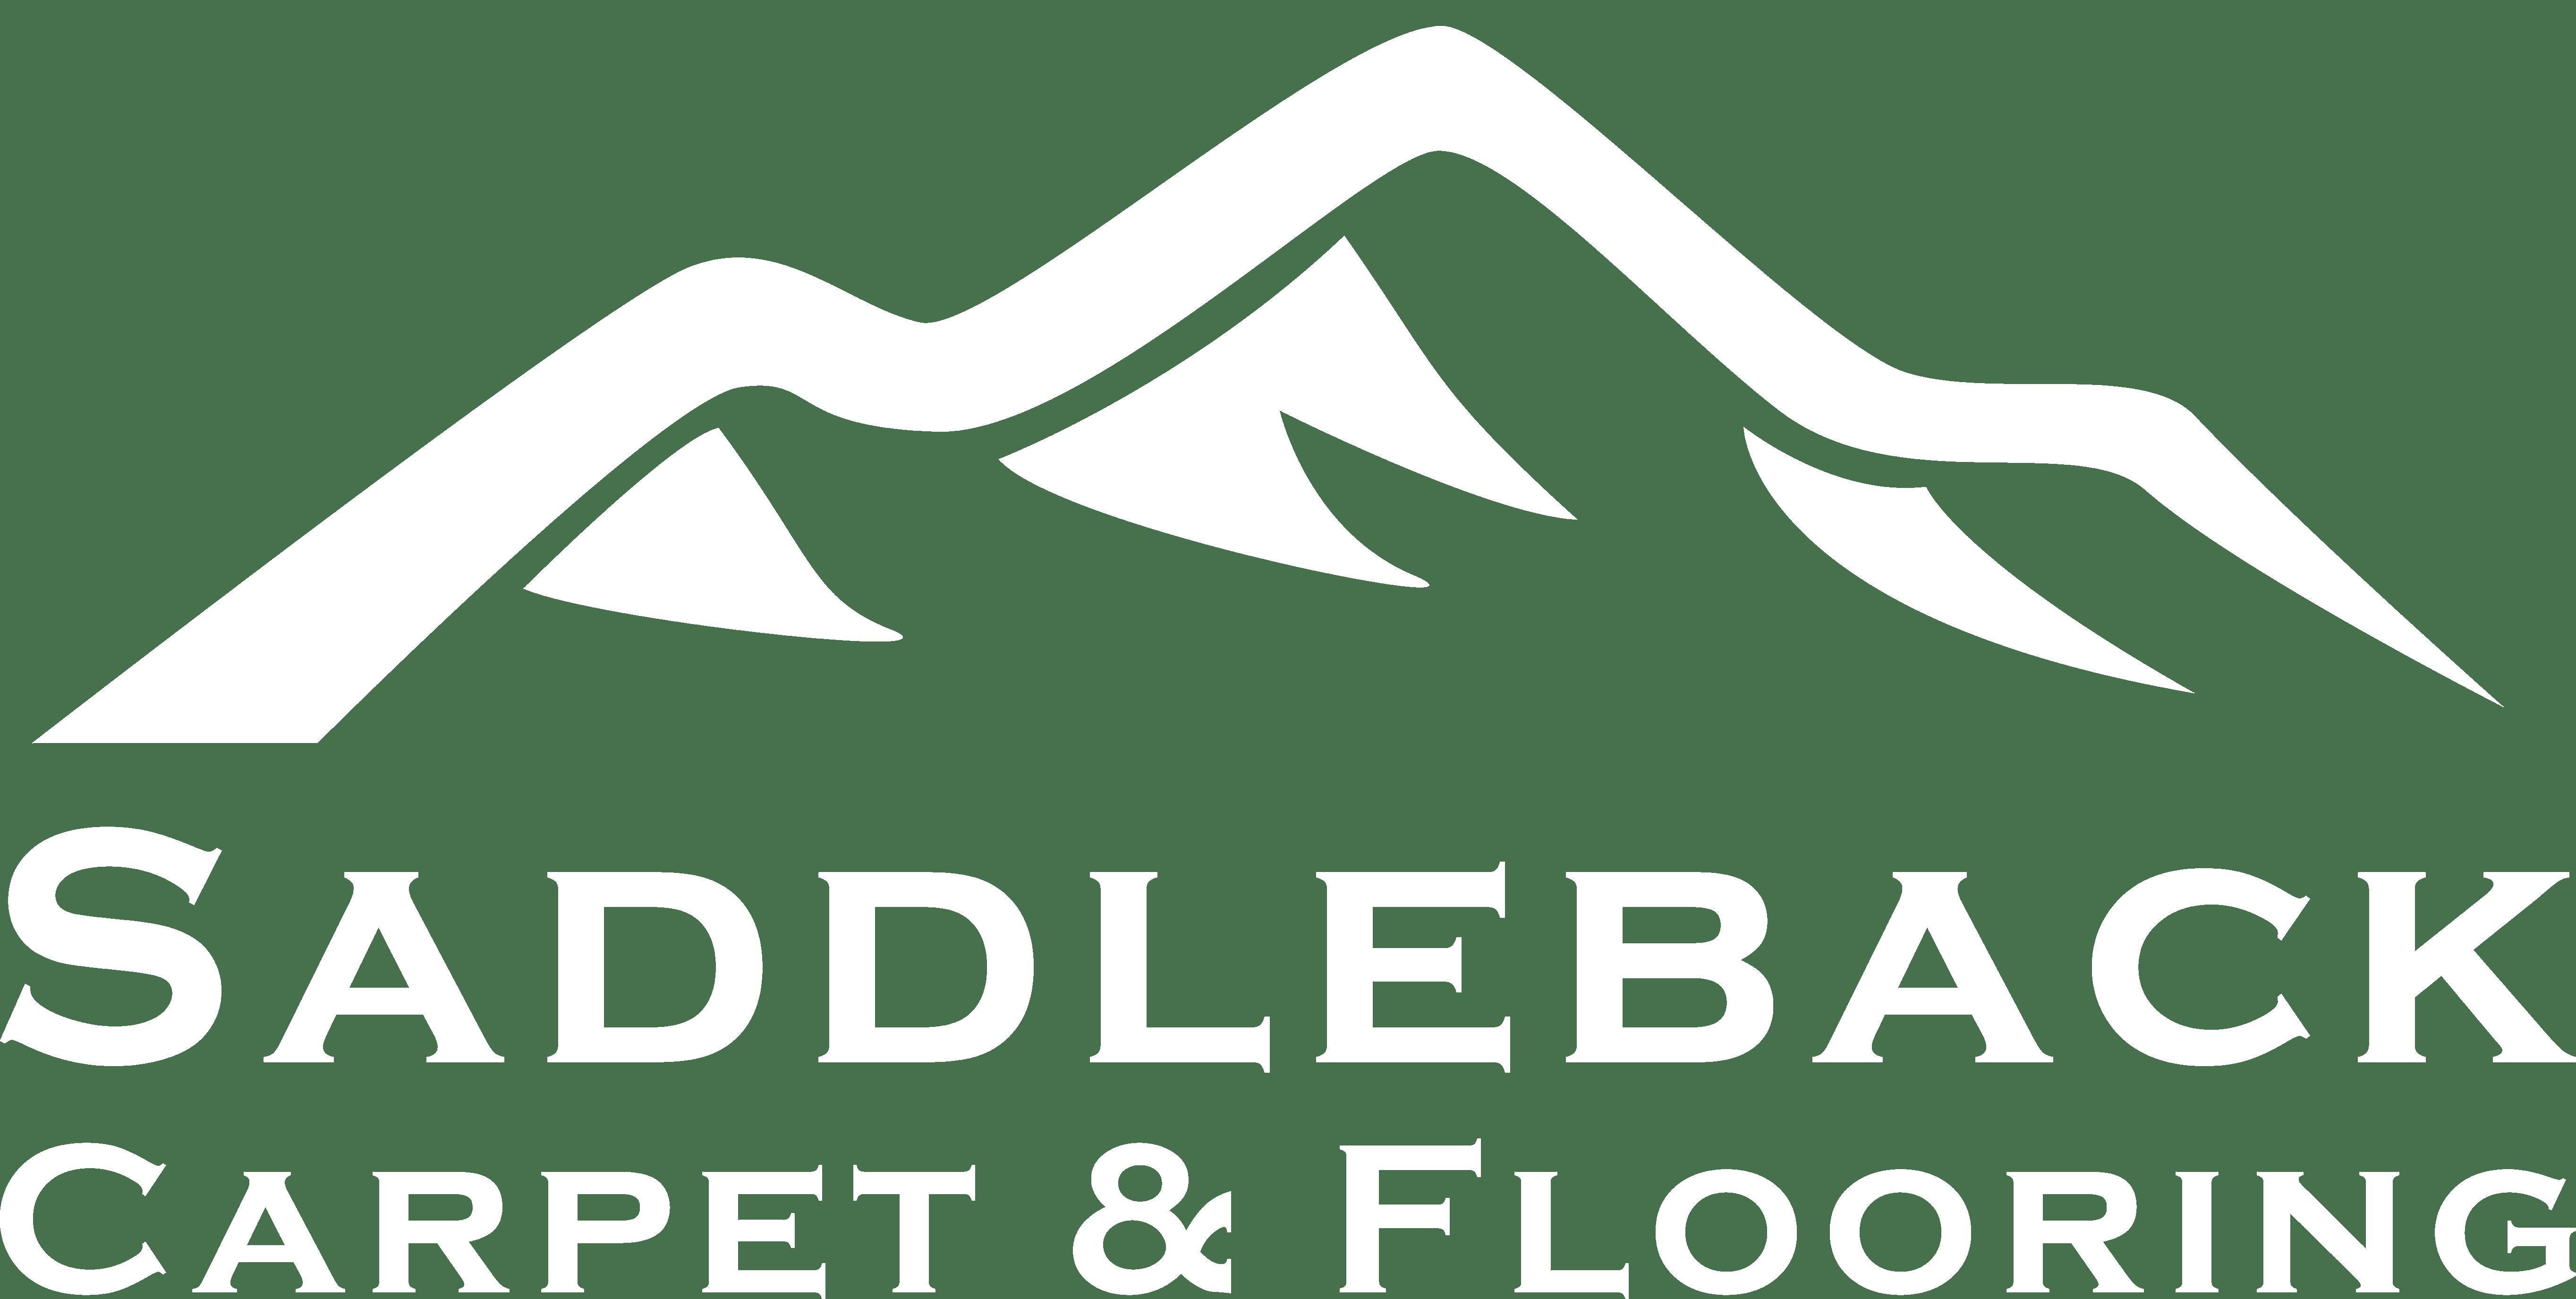 Saddleback Carpet & Flooring